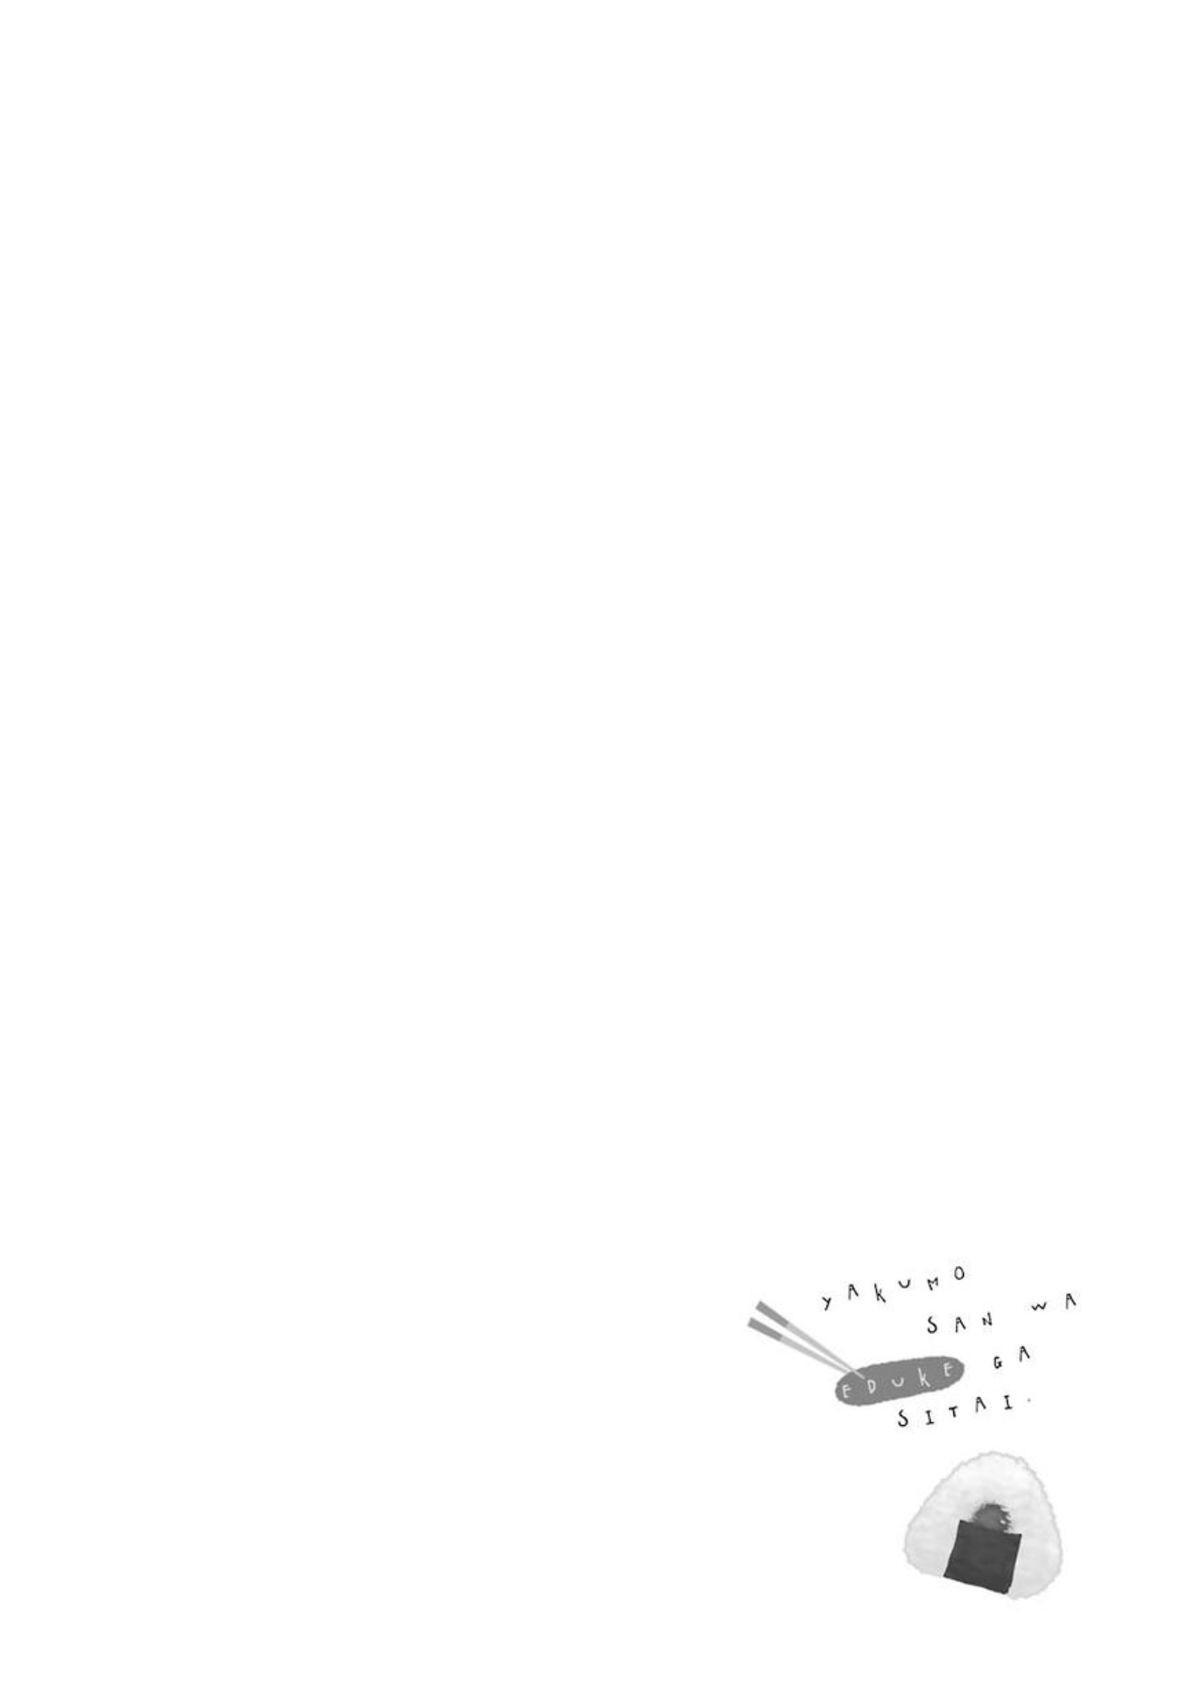 Yakumo-san wa Edzuke ga ai Chp 10. join list: WholesomeFoodManga (44 subs)Mention History.. (9000 hours in ms paint) wholesome Food manga